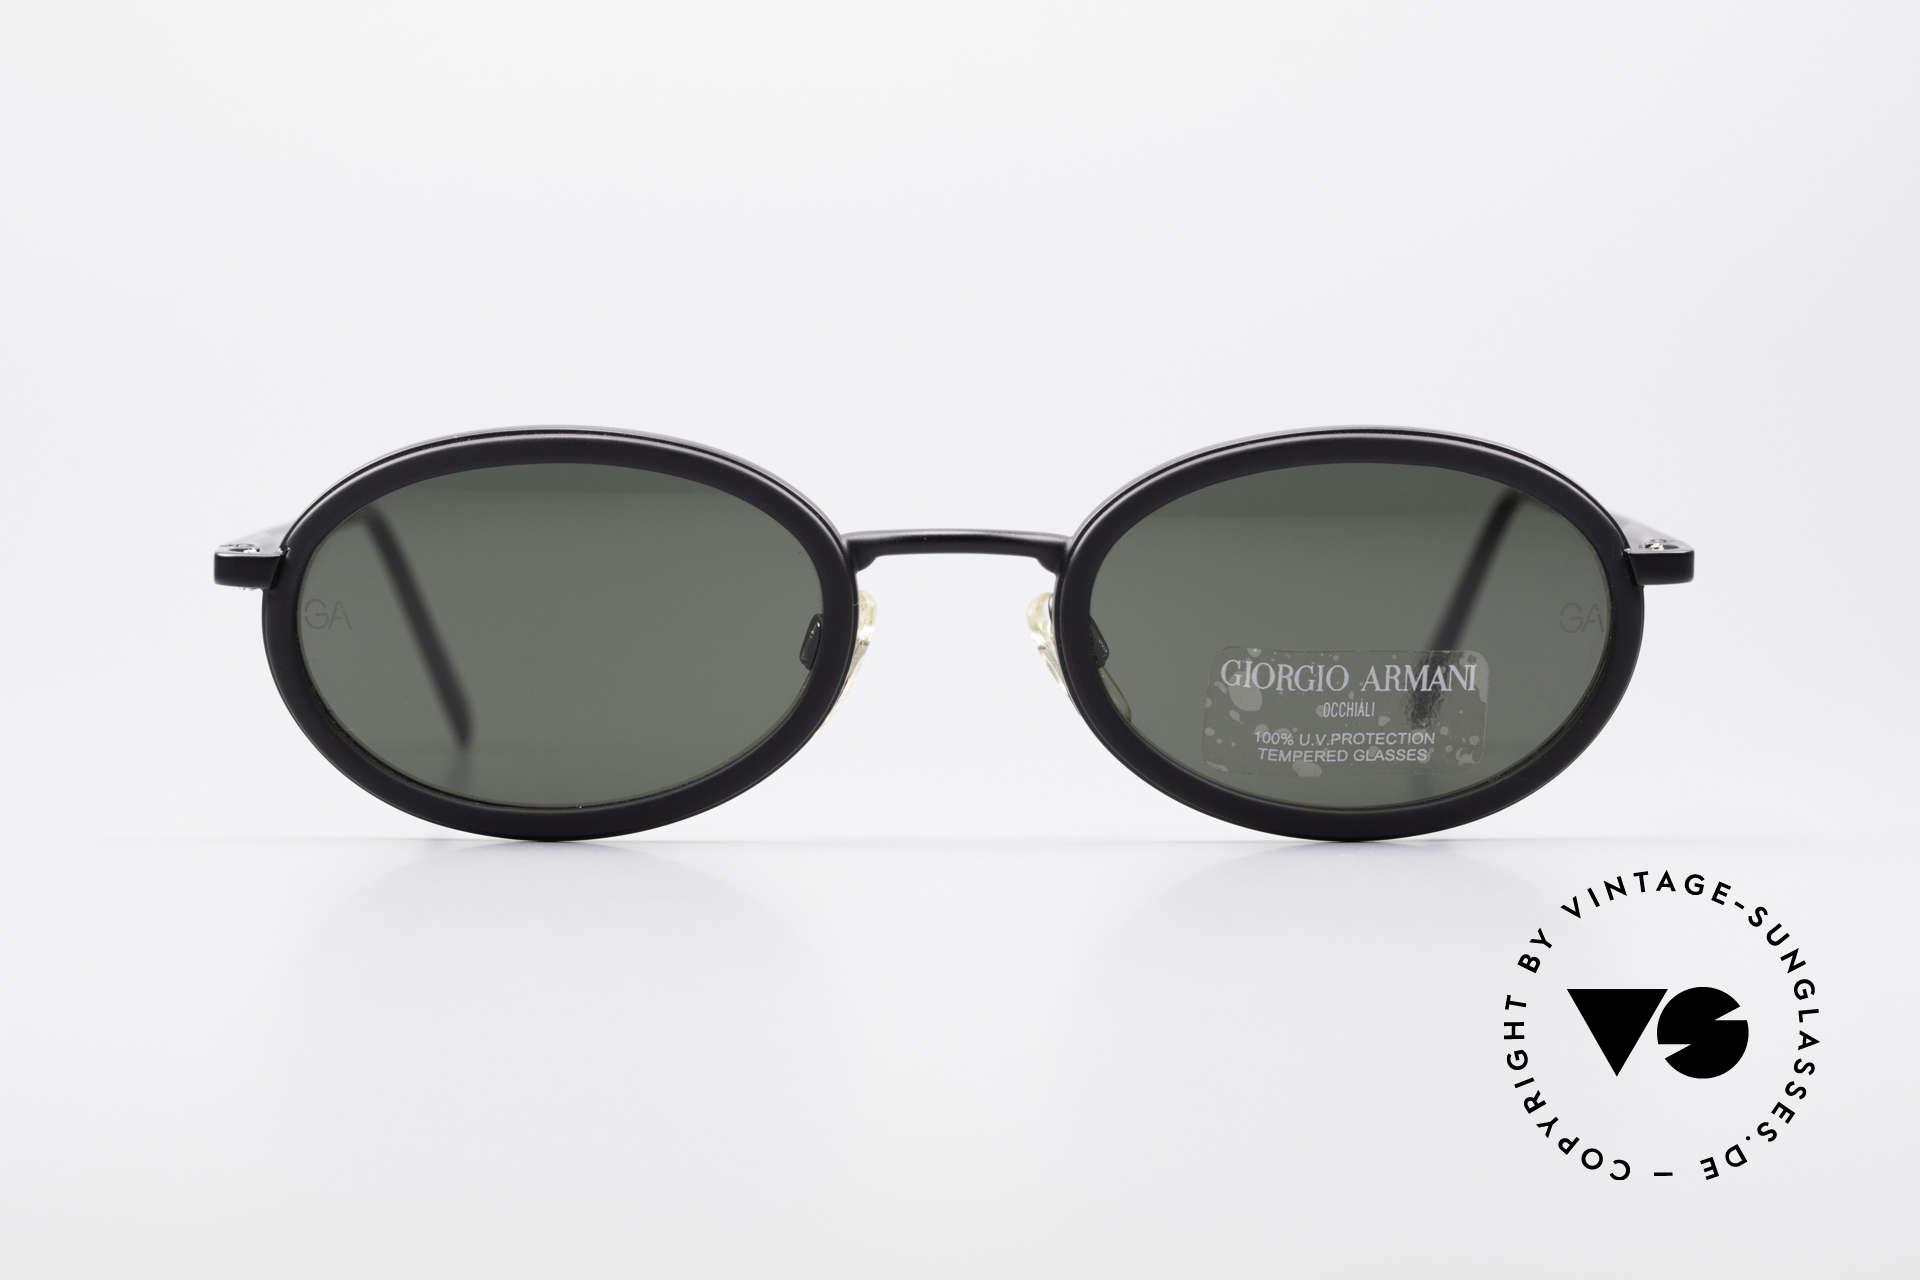 0d6c7cf43cde Sunglasses Giorgio Armani 258 Oval Vintage Sunglasses   Vintage ...